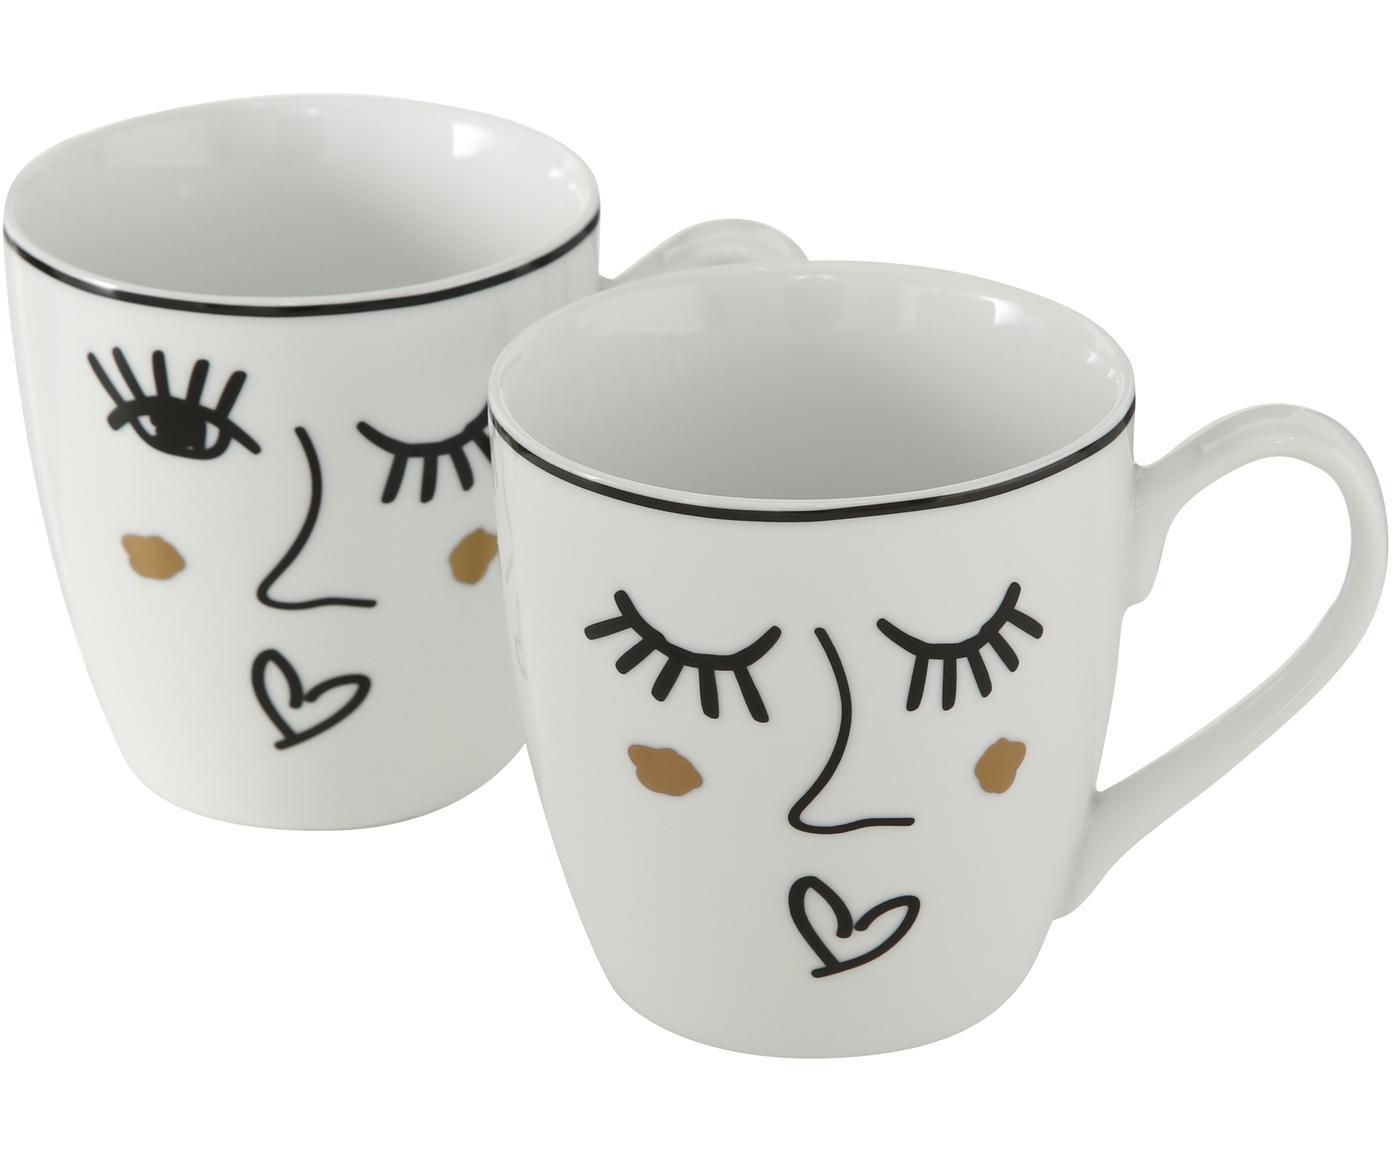 Set de tazas Glamy, 2pzas., Porcelana, Blanco, negro, Ø 10 x Al 10 cm